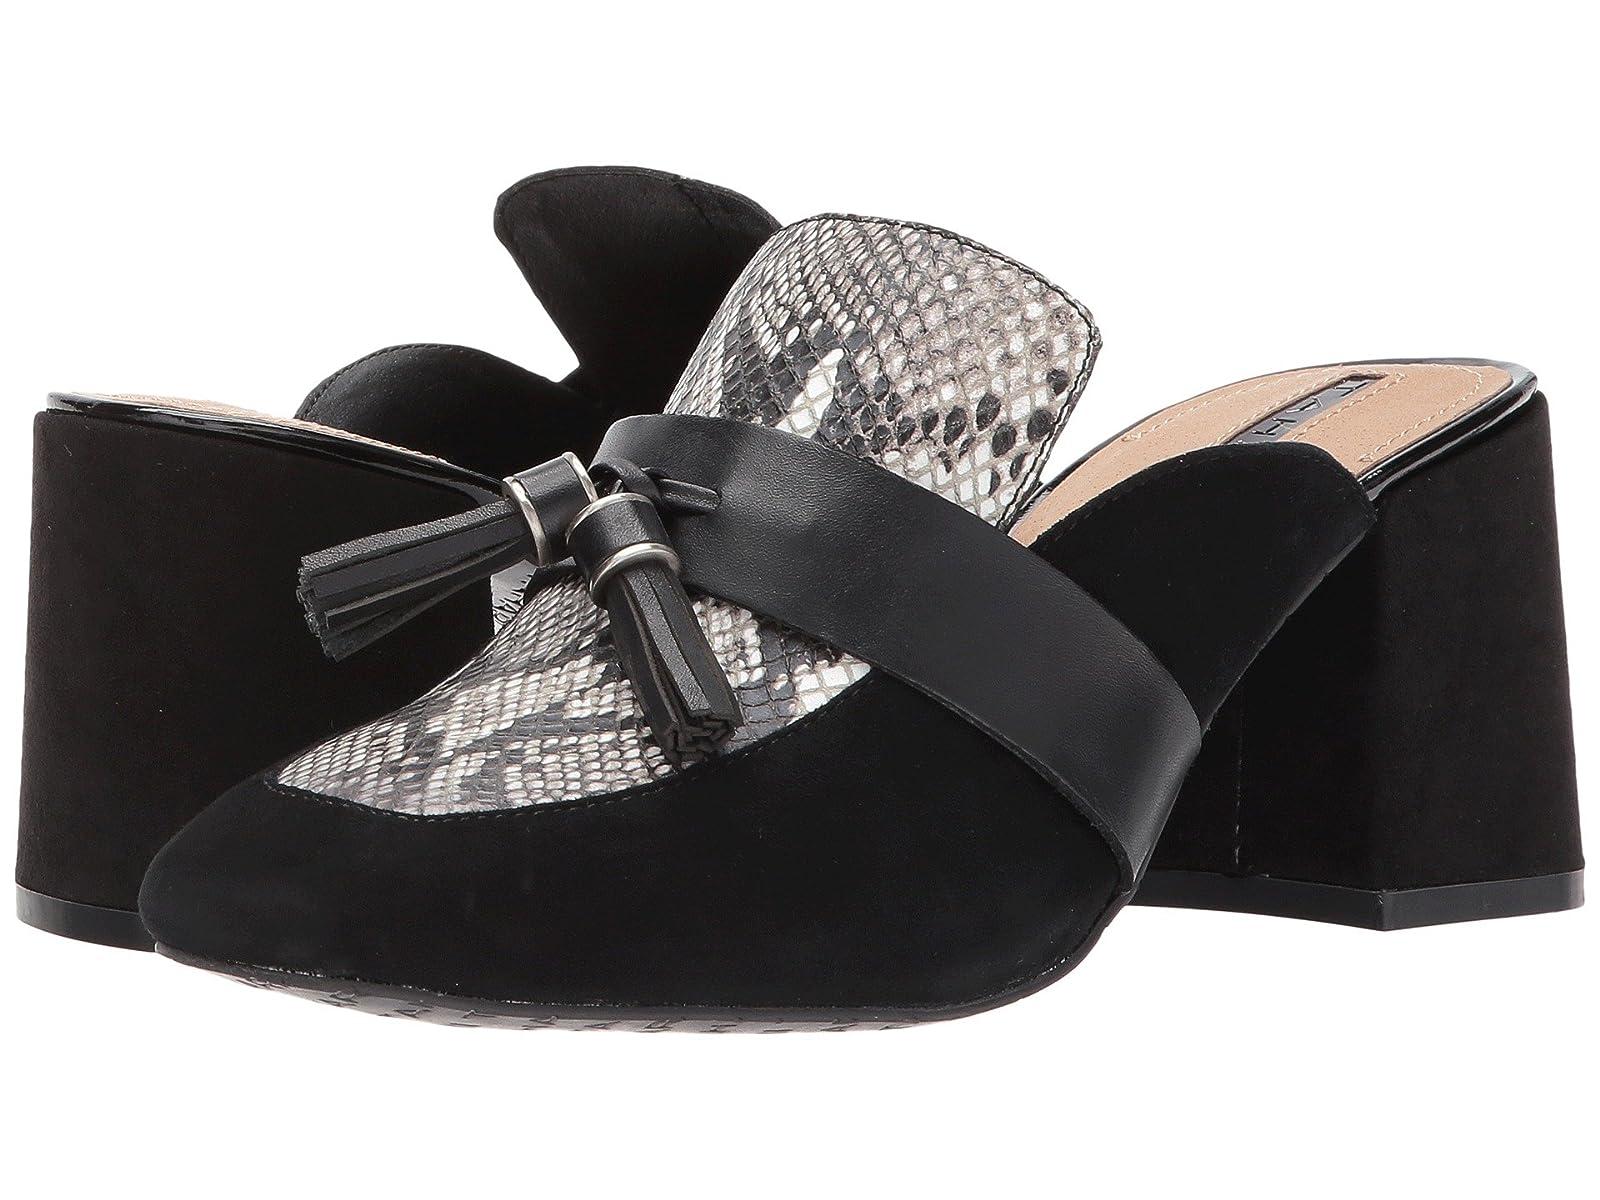 Tahari PorterCheap and distinctive eye-catching shoes